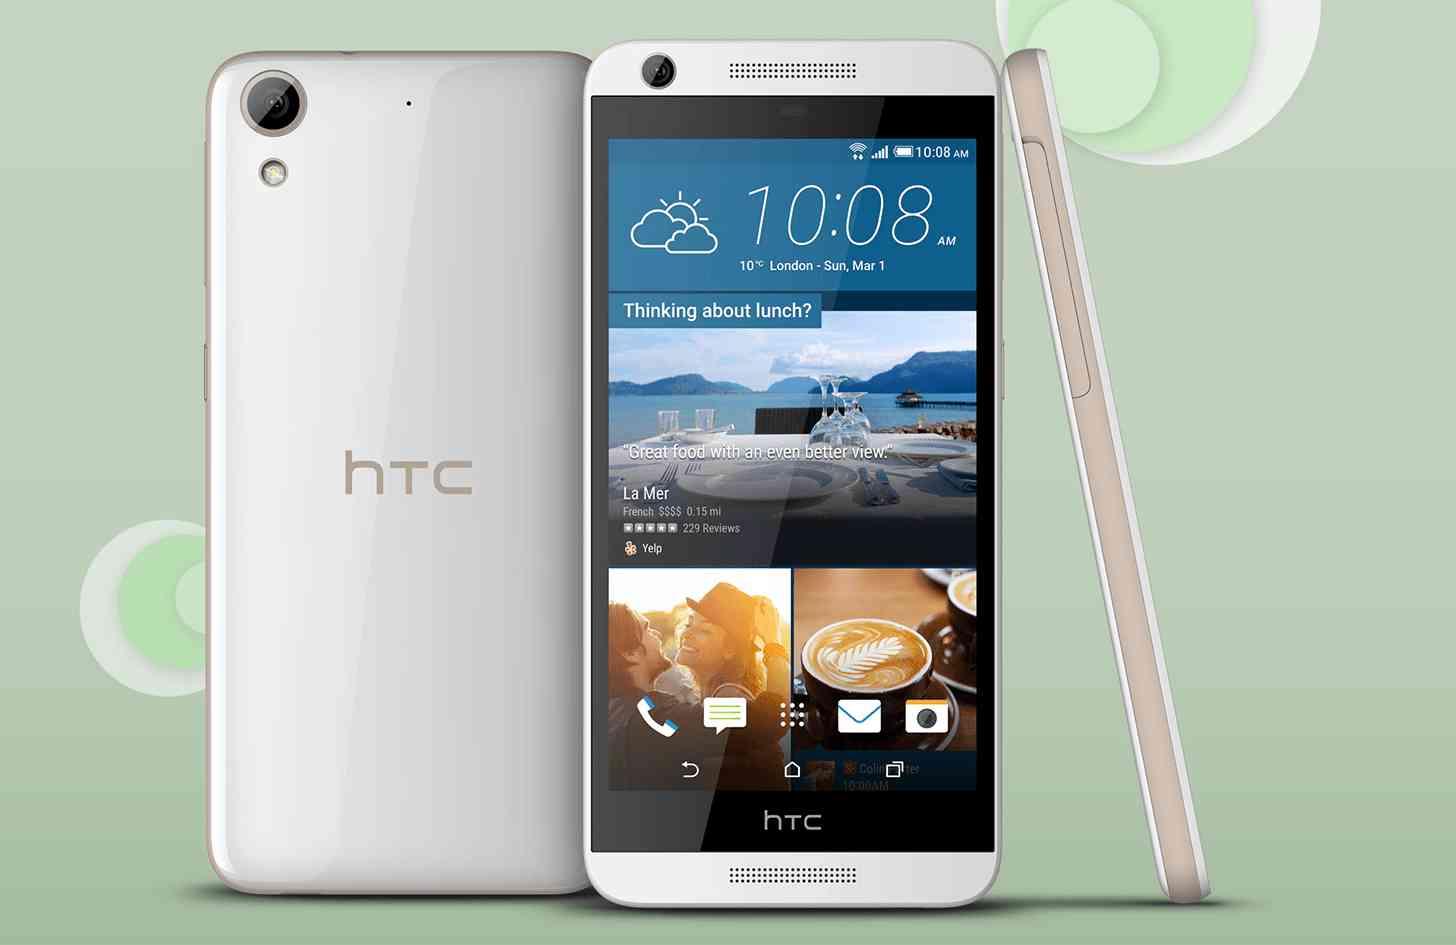 HTC Desire 626 large